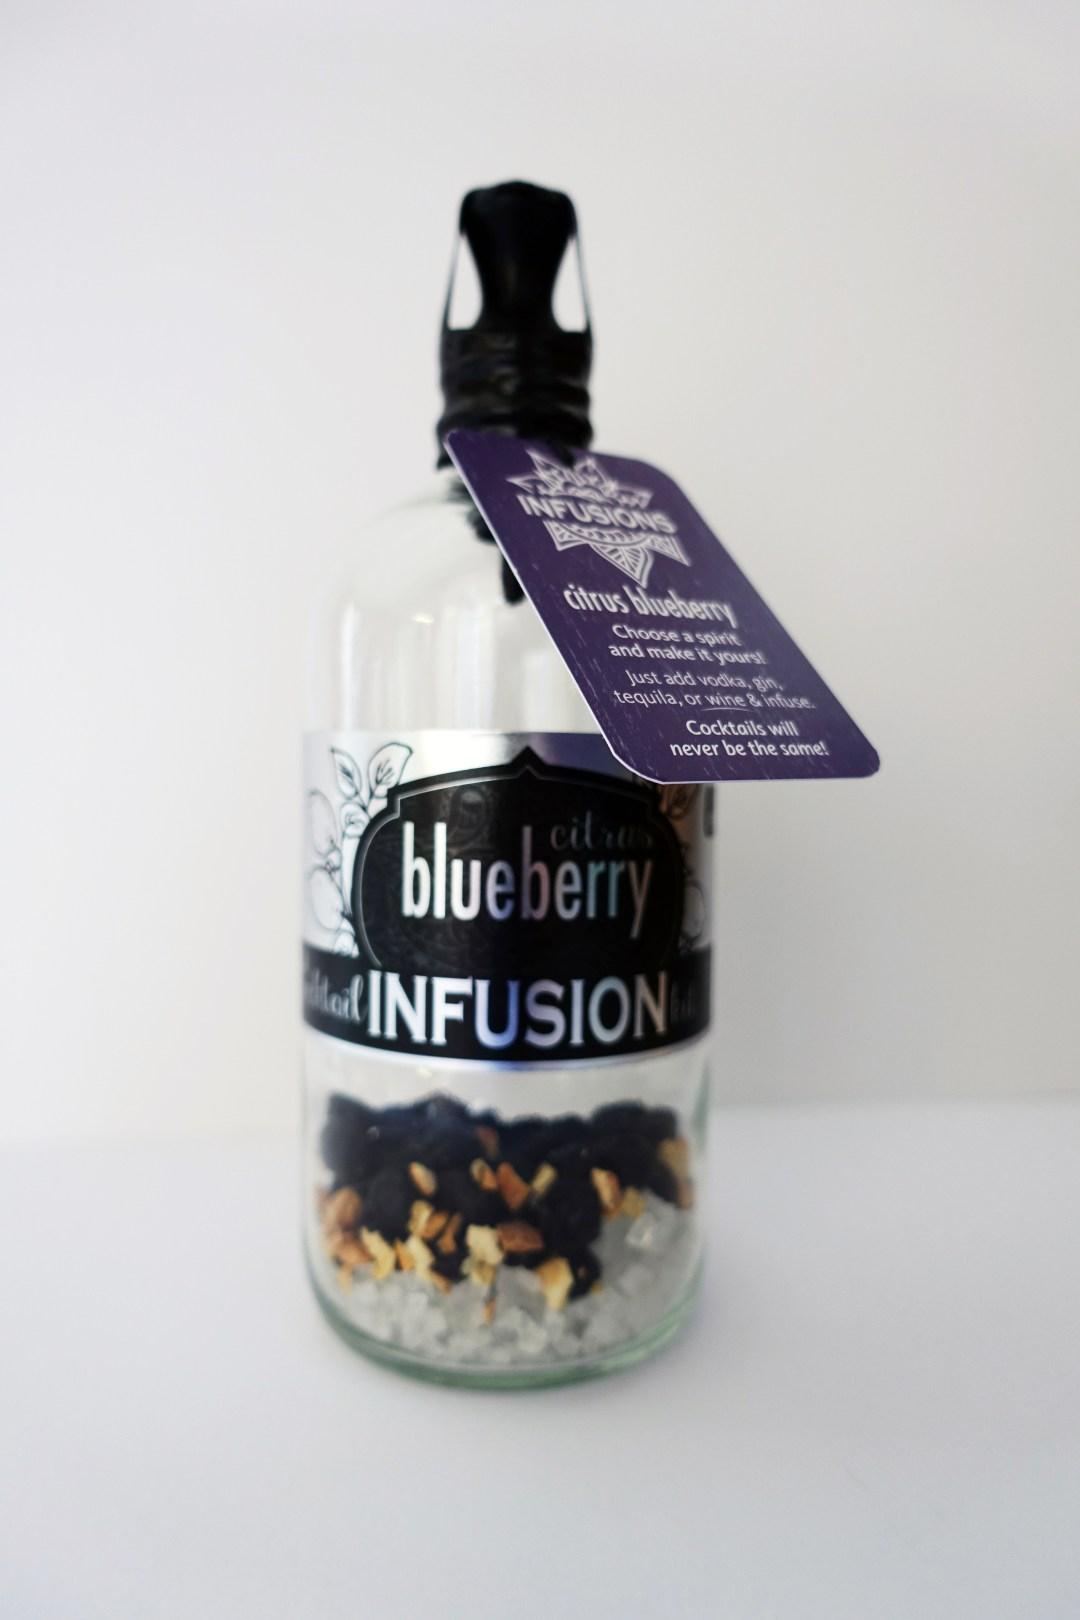 rokz Citrus Blueberry Infusion Kit